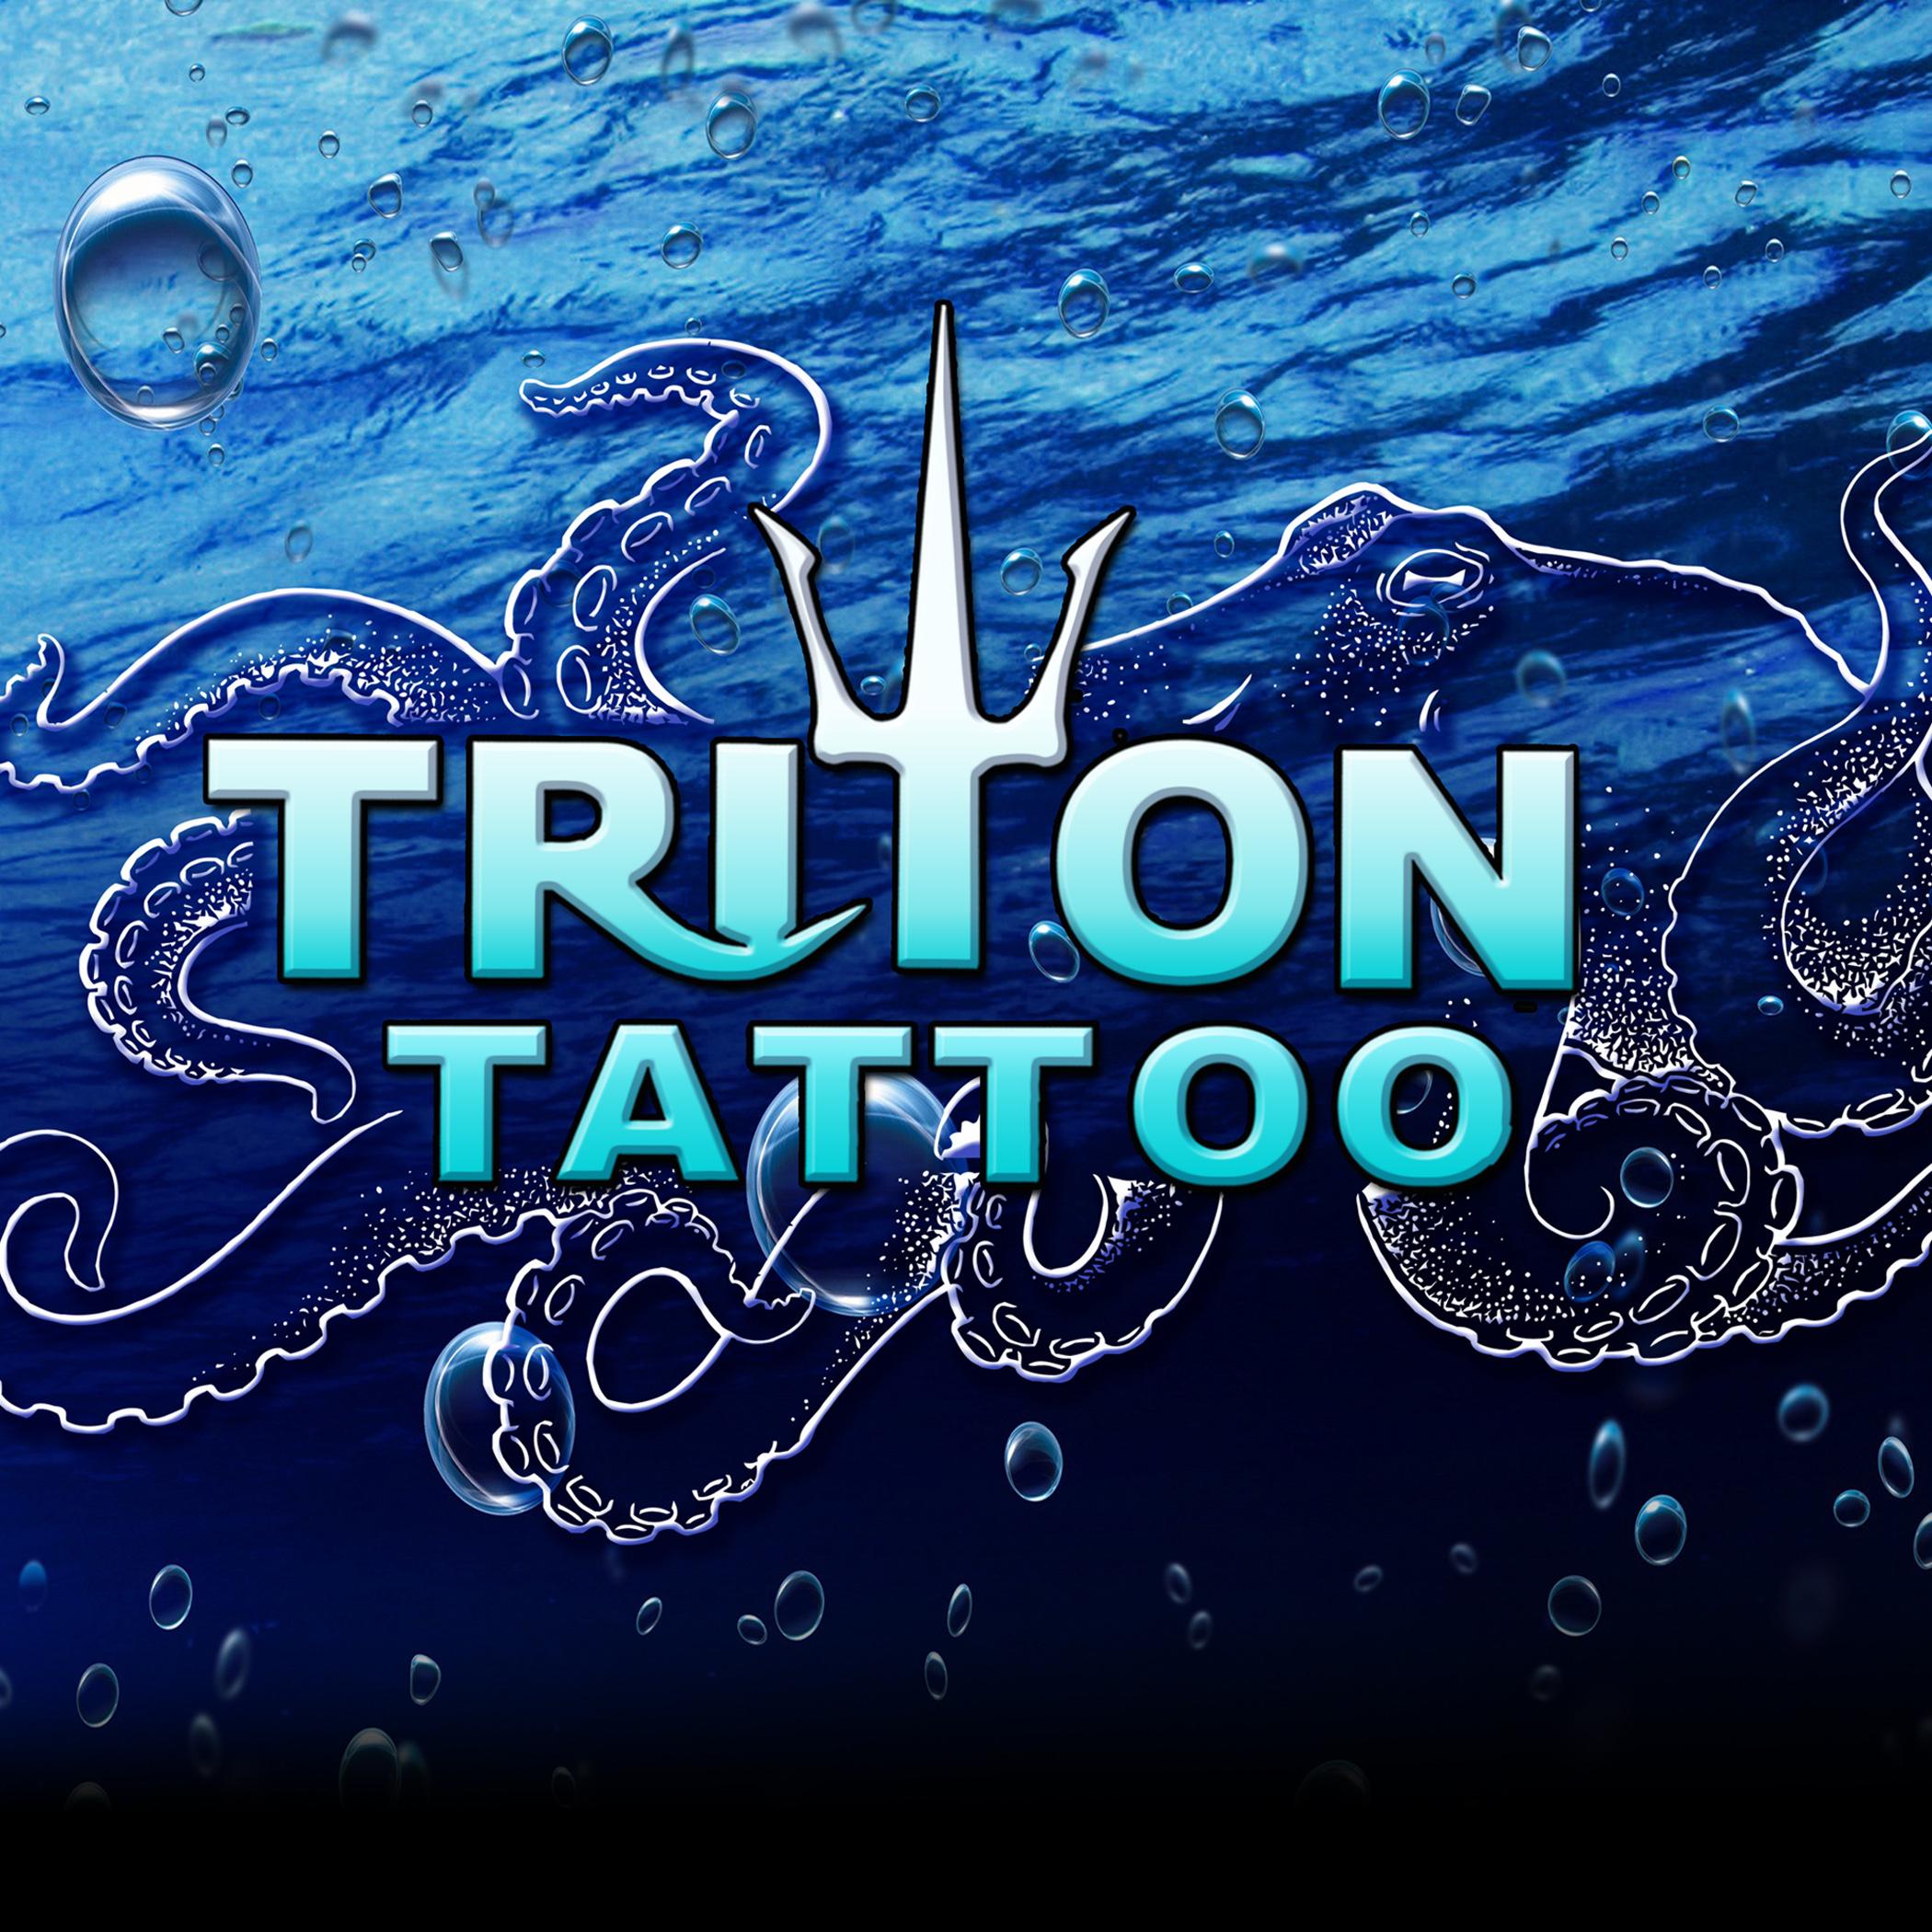 triton tattoo north palm beach. Black Bedroom Furniture Sets. Home Design Ideas